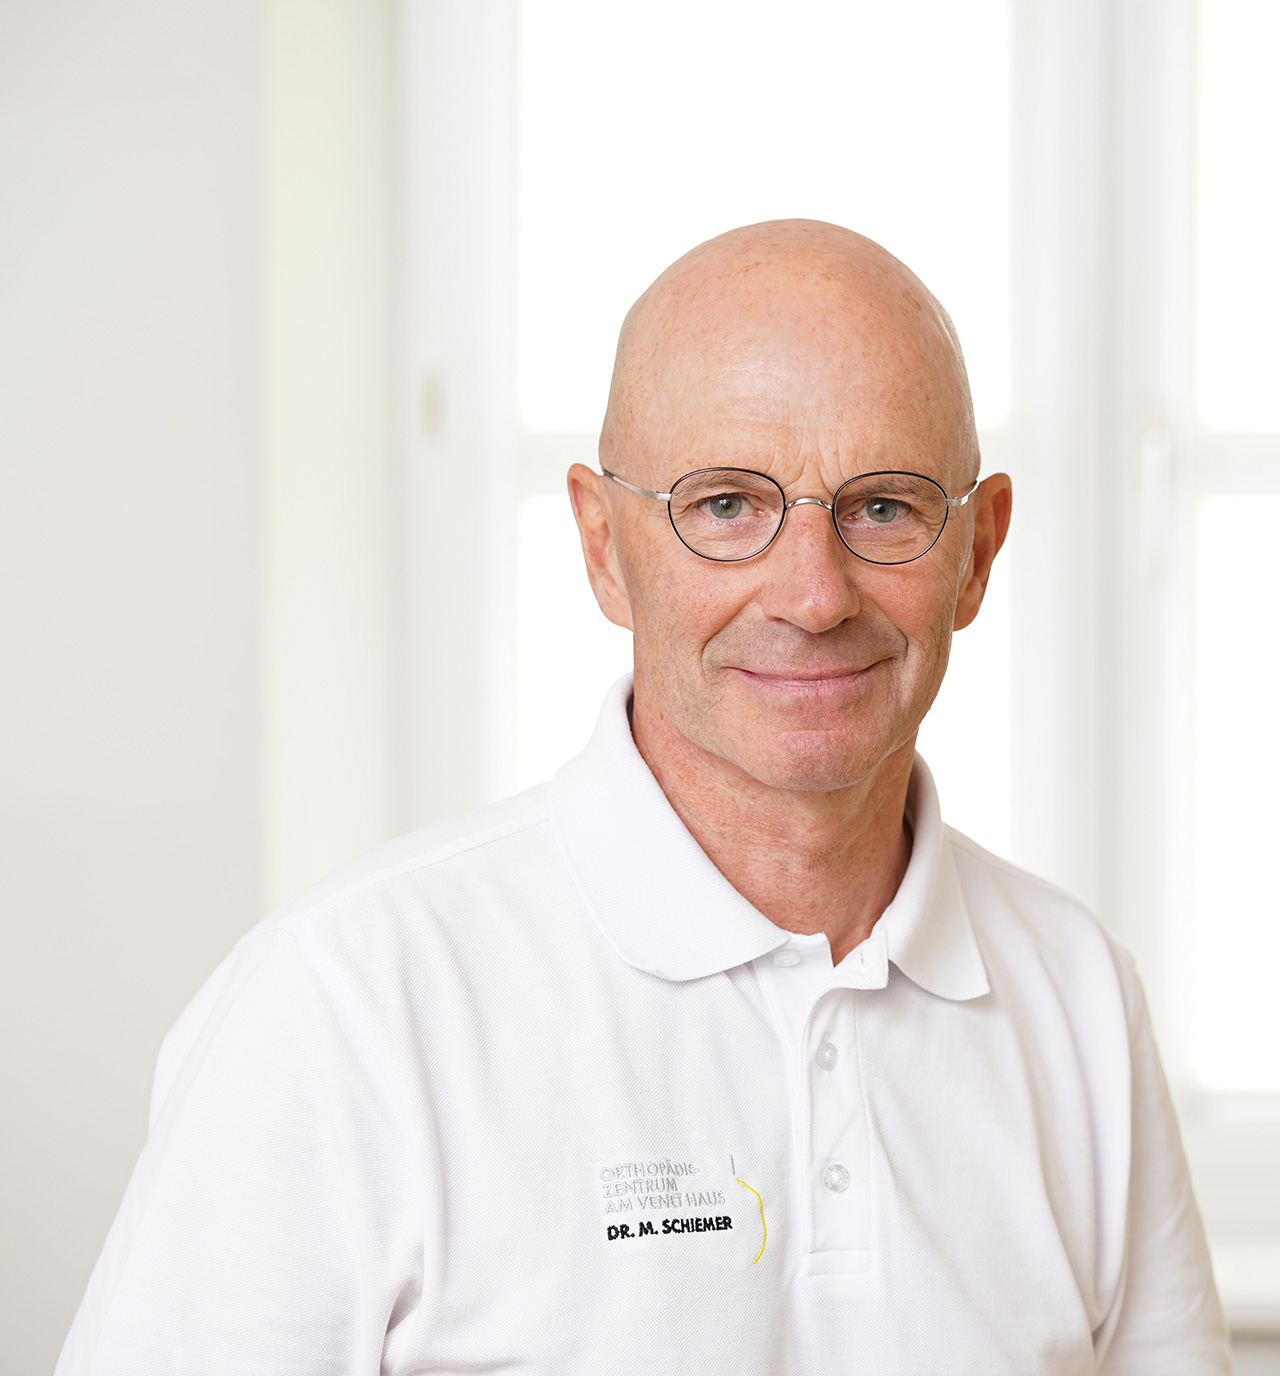 Orthopädiezentrum am Venet Haus –Dr. med. M. Schiemer